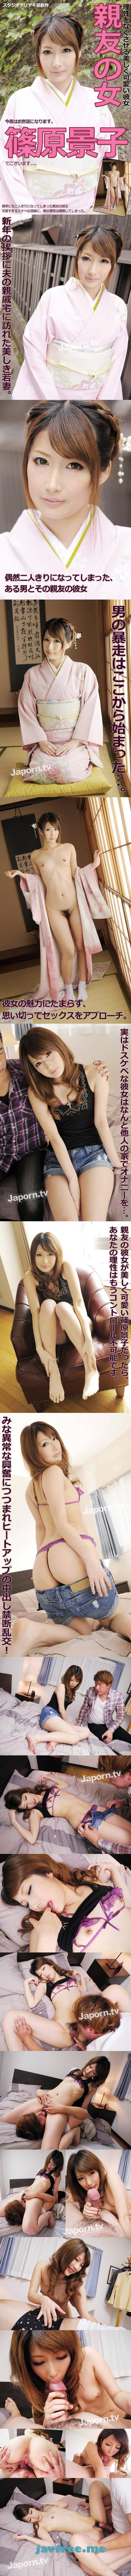 [PT 116] 親友の彼女 : 篠原景子 親友の彼女 篠原景子 PT Keiko Shinohara